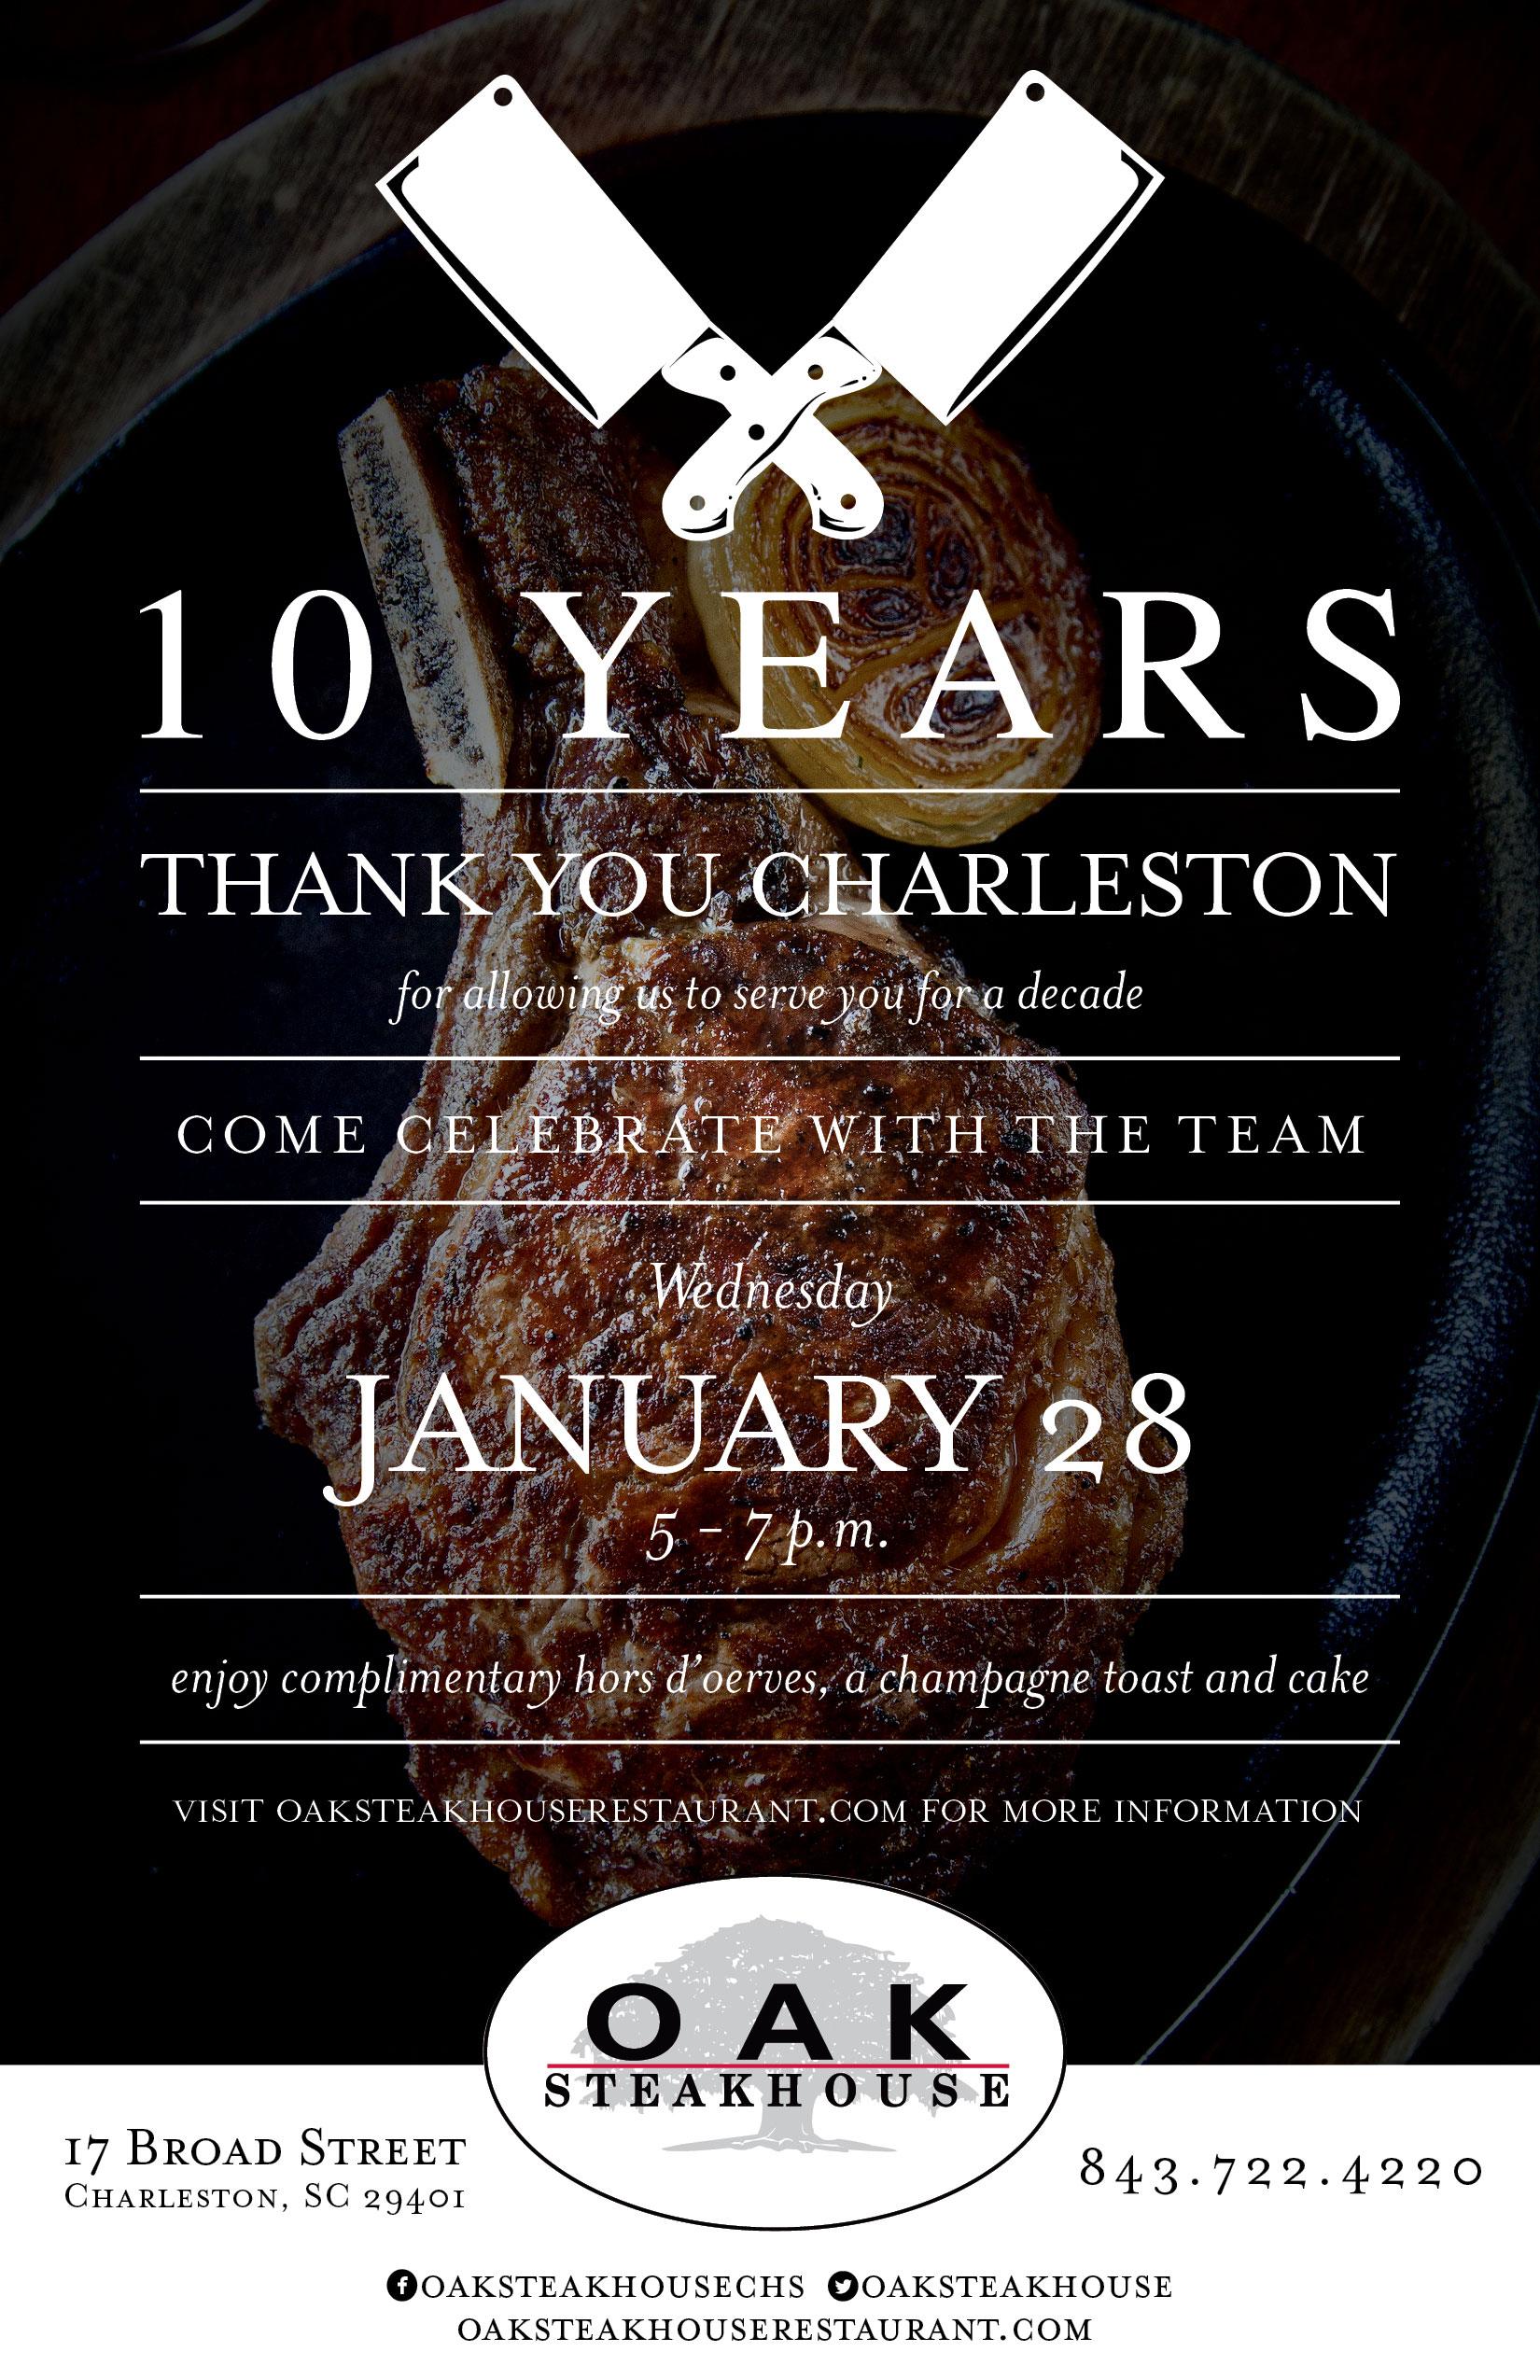 Event: Oak Steakhouse, Charleston, SC